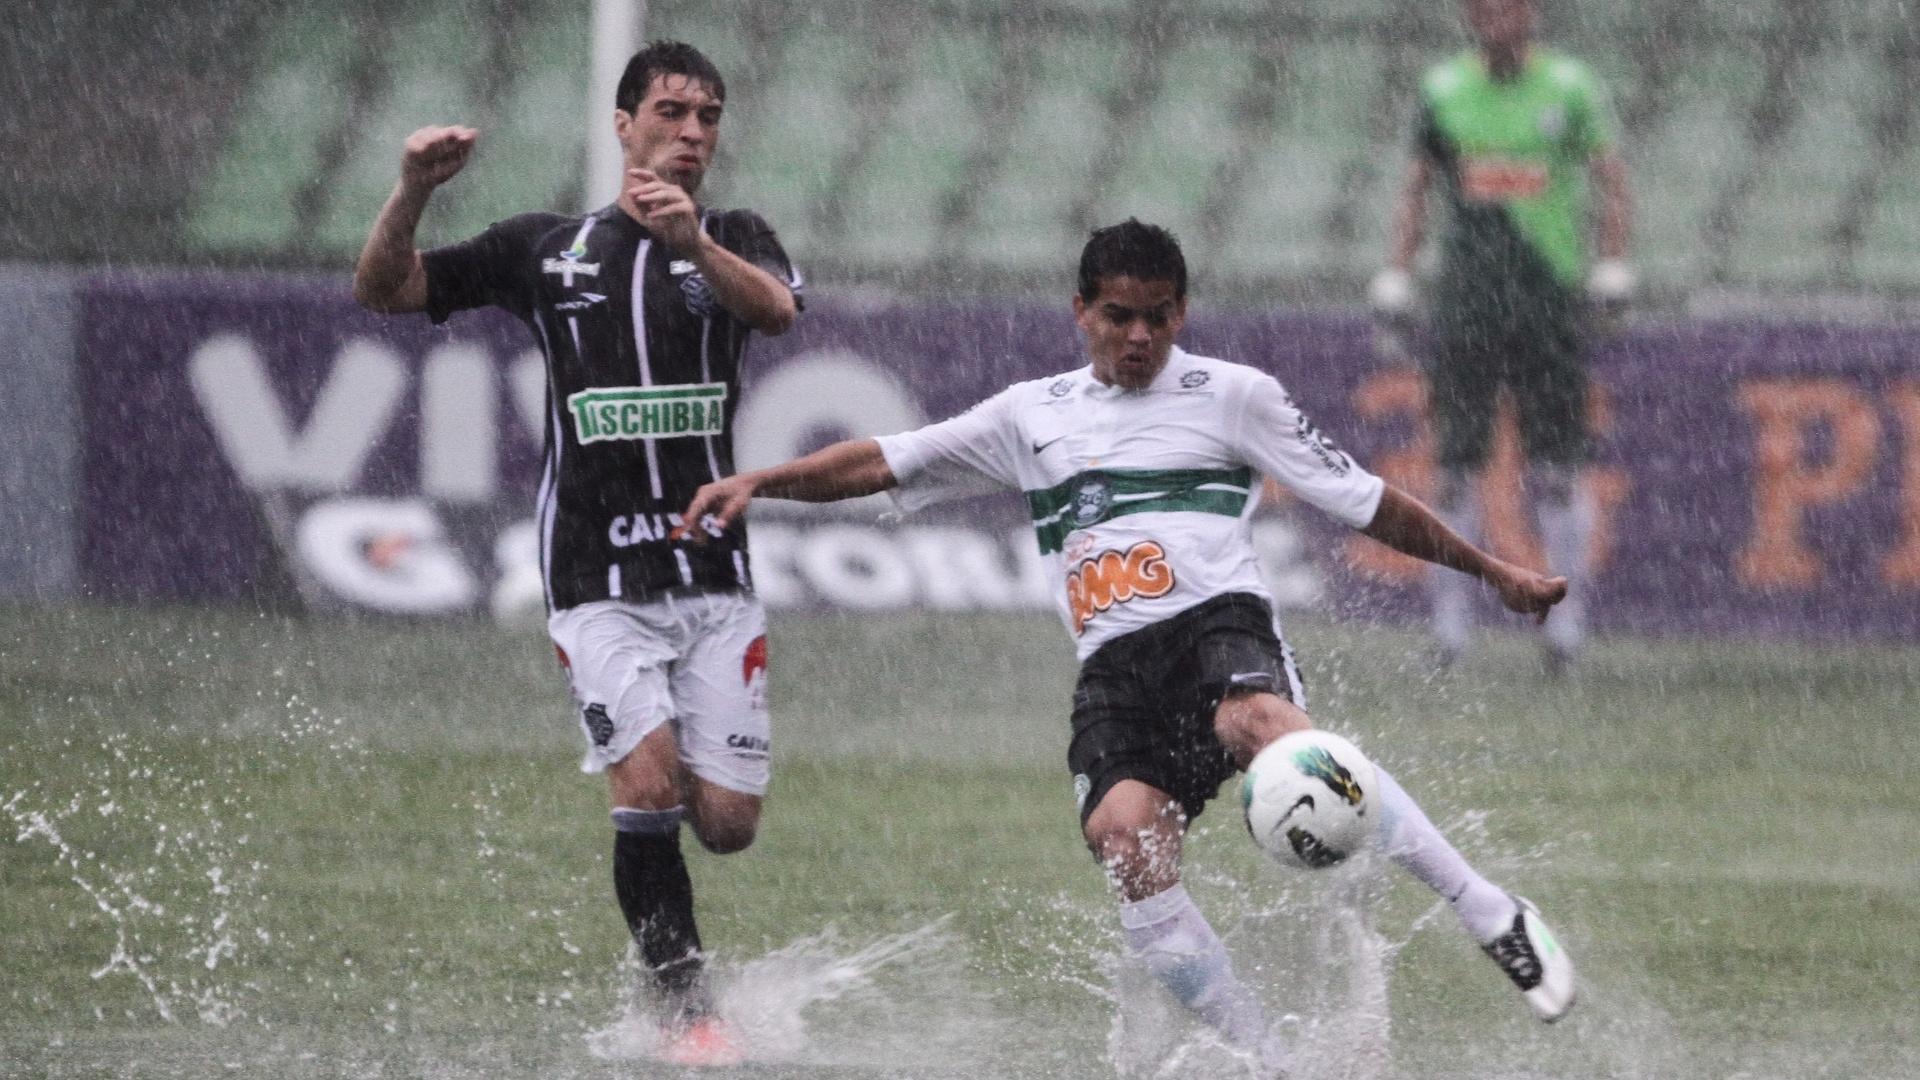 02.dez.2012 - Forte chuva castigou o duelo entre Coritiba, equipe de Dênis (dir.), e Figueirense, time do Willian, pelo Campeonato Brasileiro